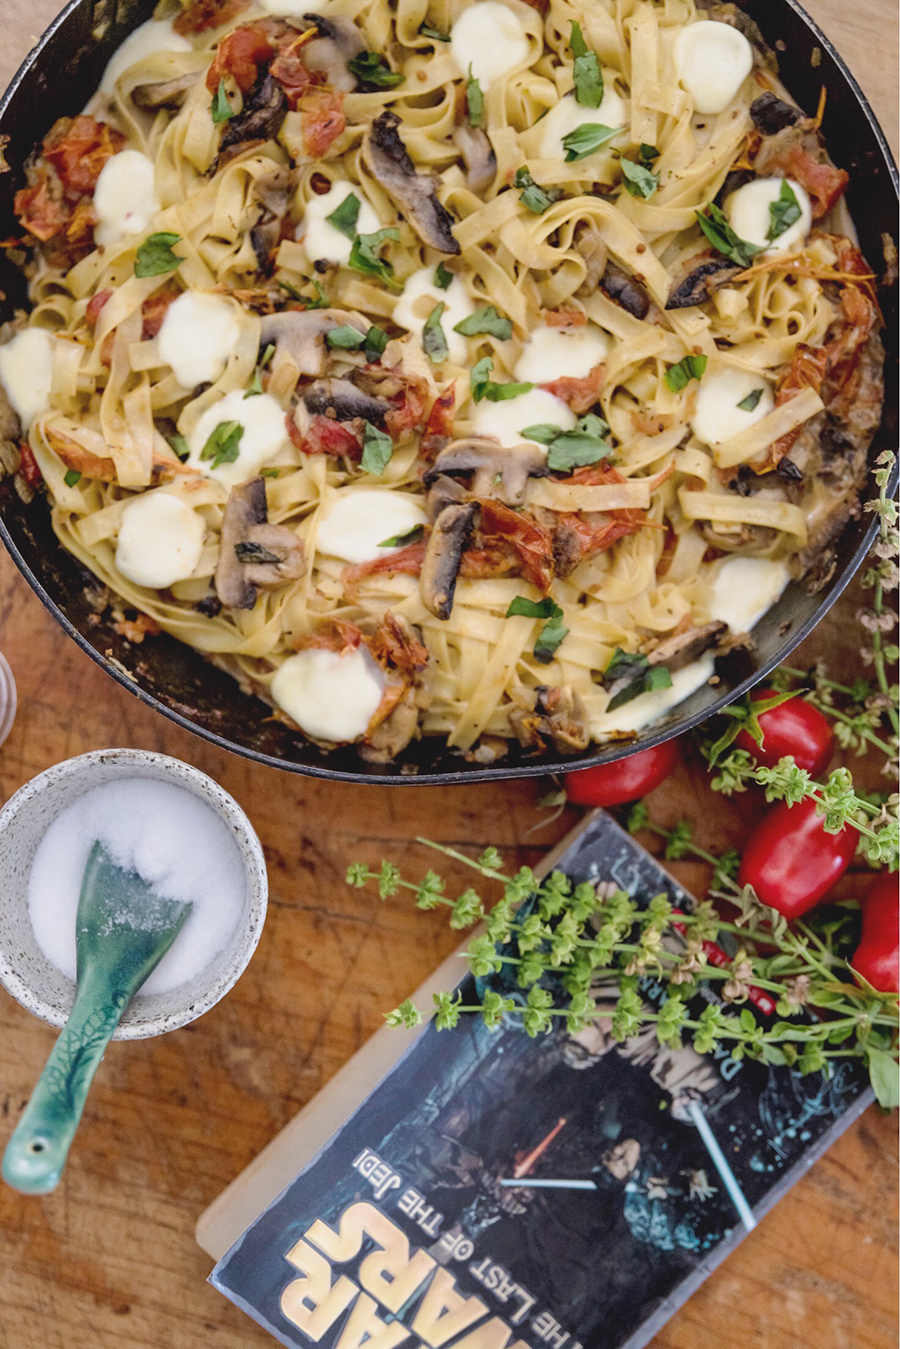 Tide Kitchen: Sun-Dried Tomato & Mushroom Boba Fett-uccine